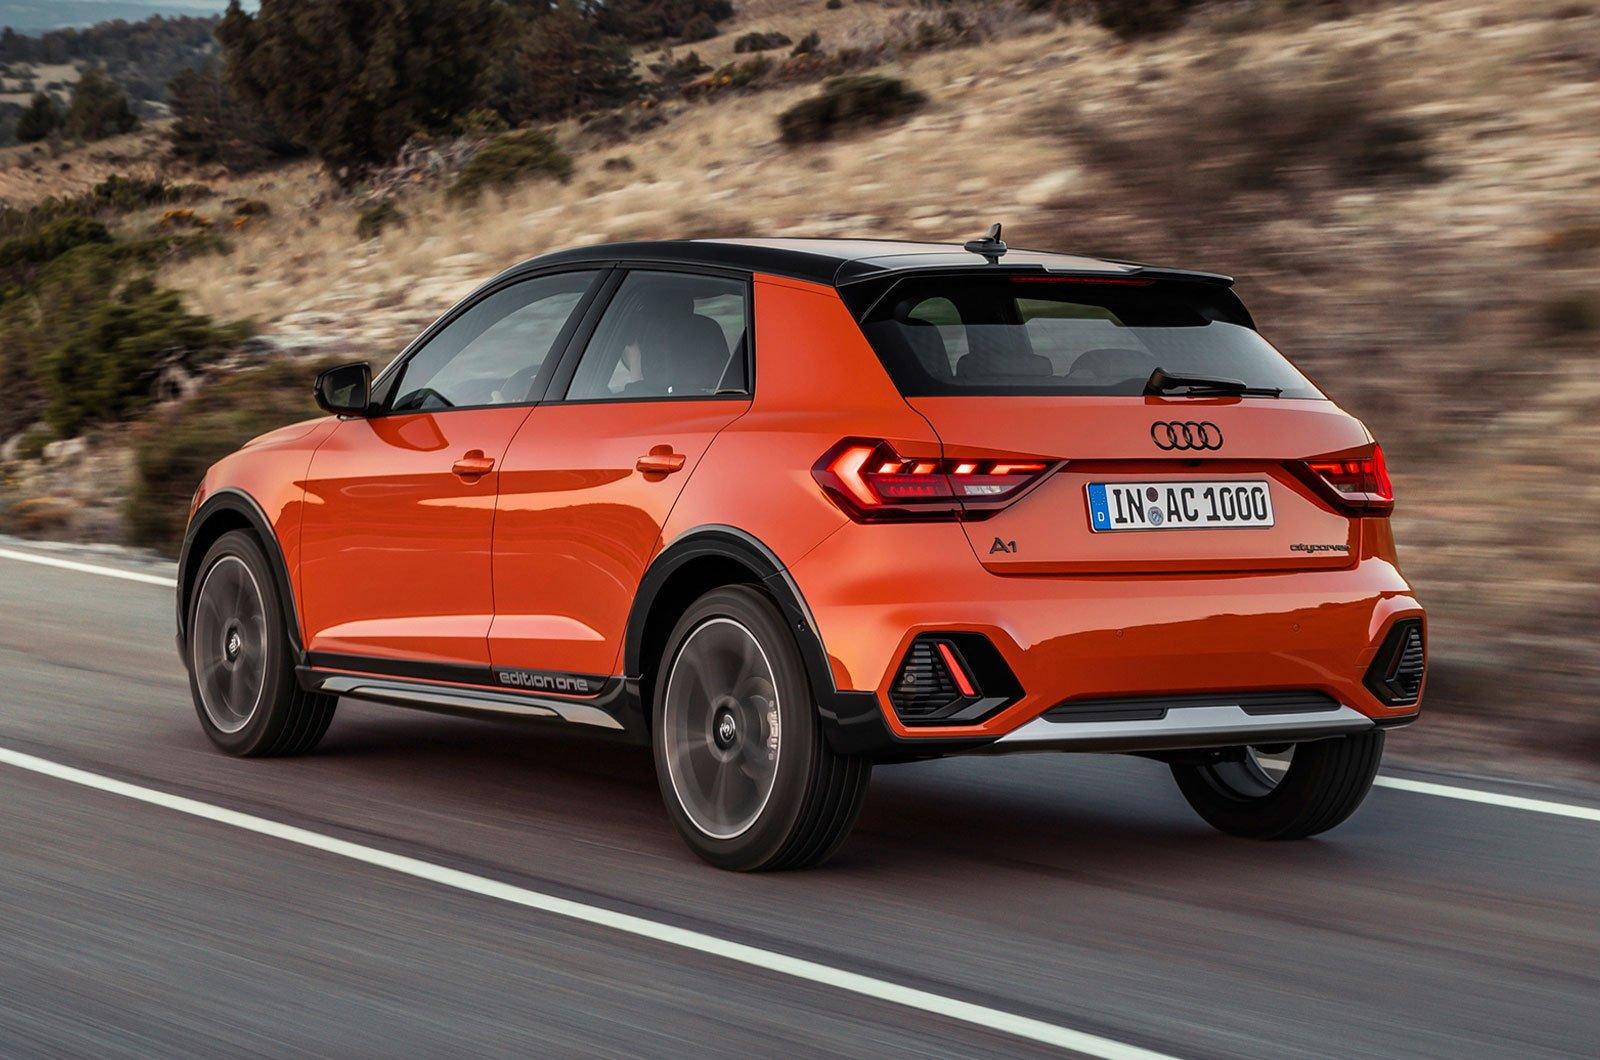 Audi A1 Citycarver rear